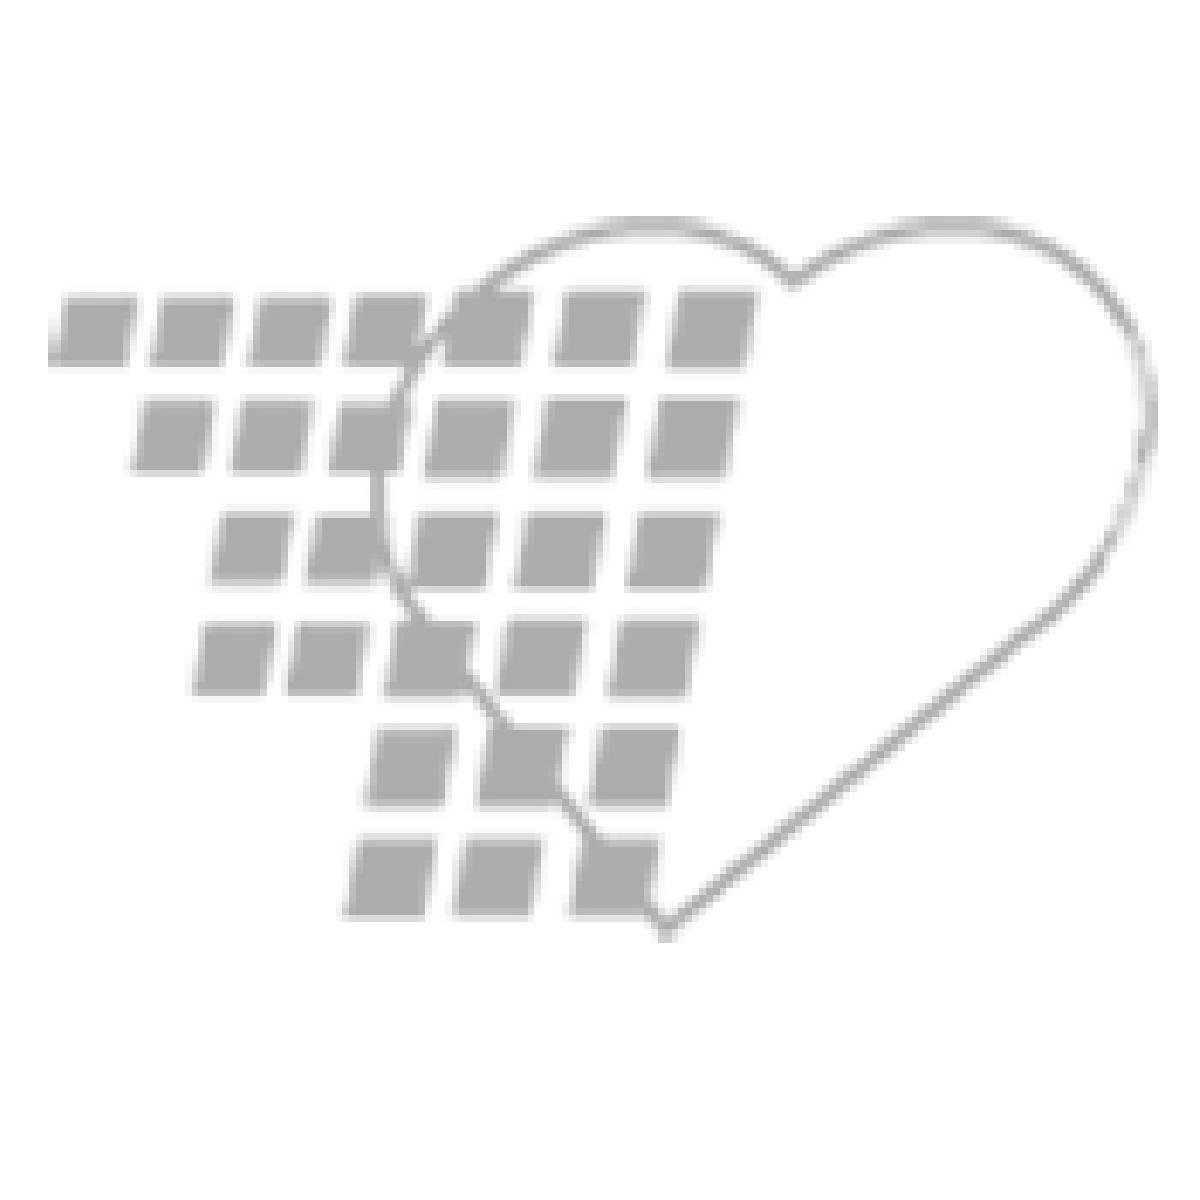 06-93-0307 - Demo Dose® Long Term Dilantn 100 mg Medication Pack